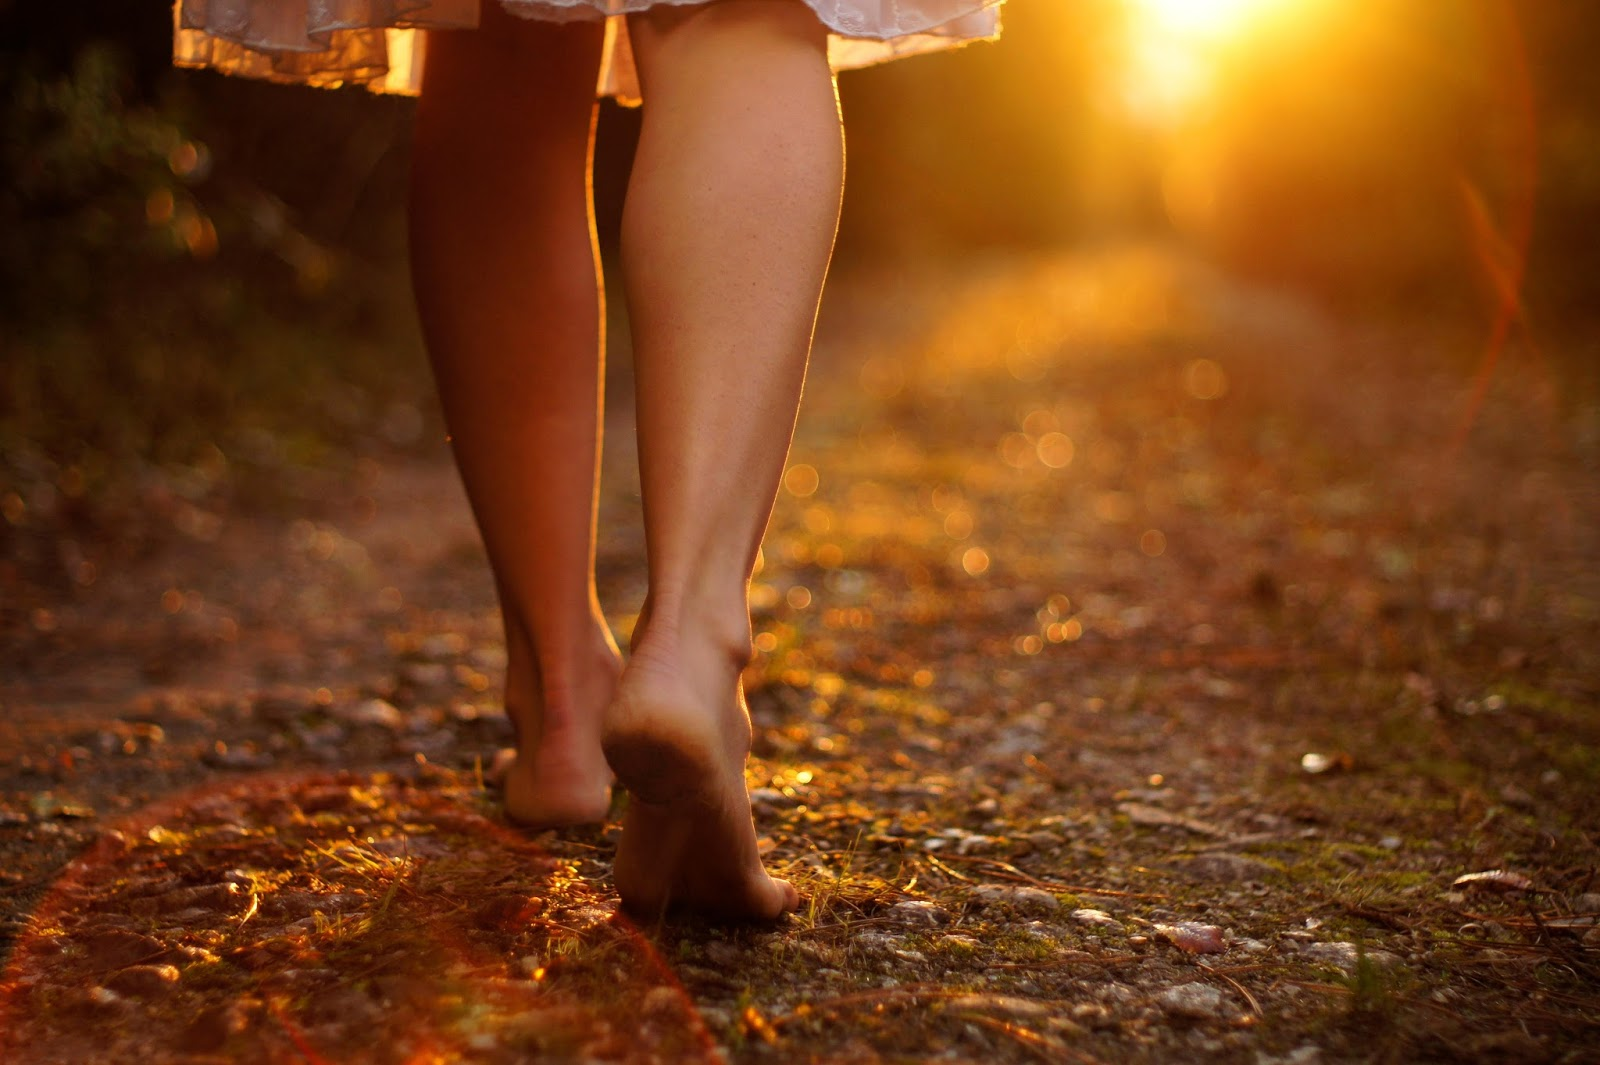 Udah Tau Mengenai Tujuh Manfaat Menakjubkan Berjalan Tanpa Alas Kaki? Yuk Simak!